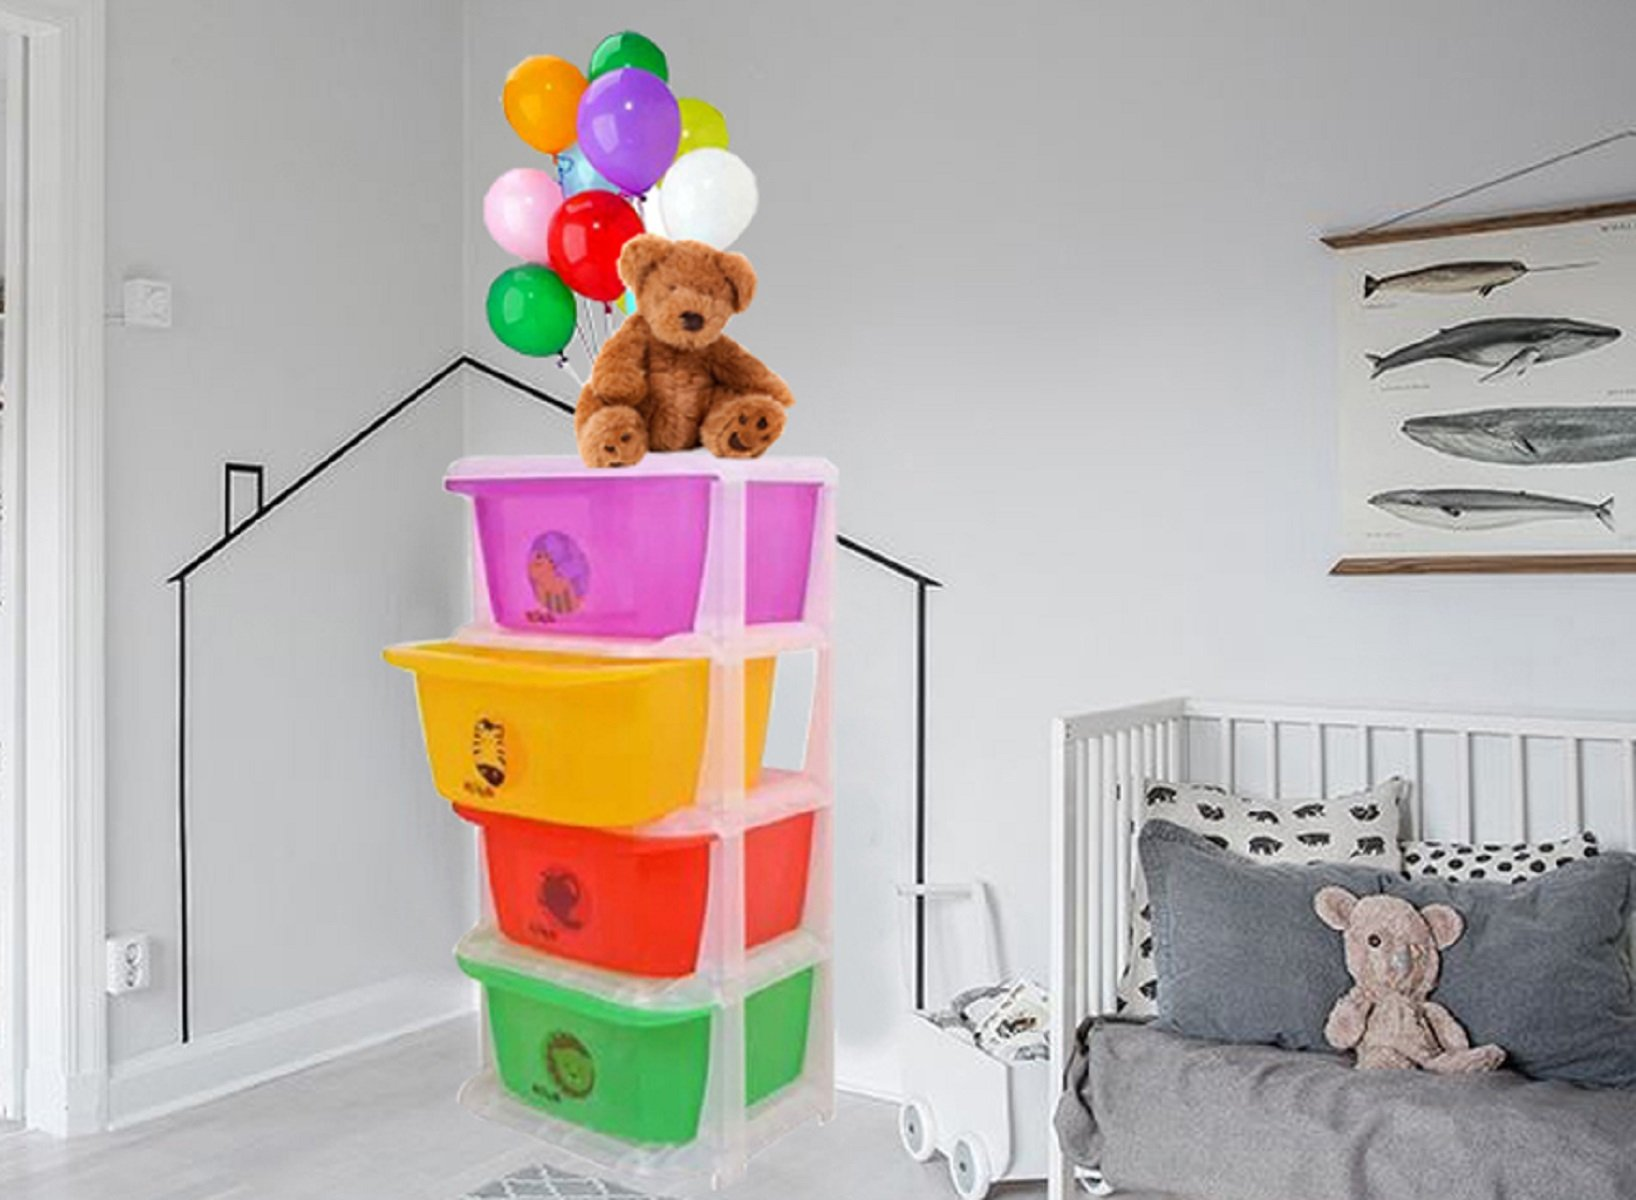 Kuber Industries Storage Drawers Basket for Kitchen/Office/Children/Toy With 4 Drawer in Moduler Design (Multiple usages) Basket009